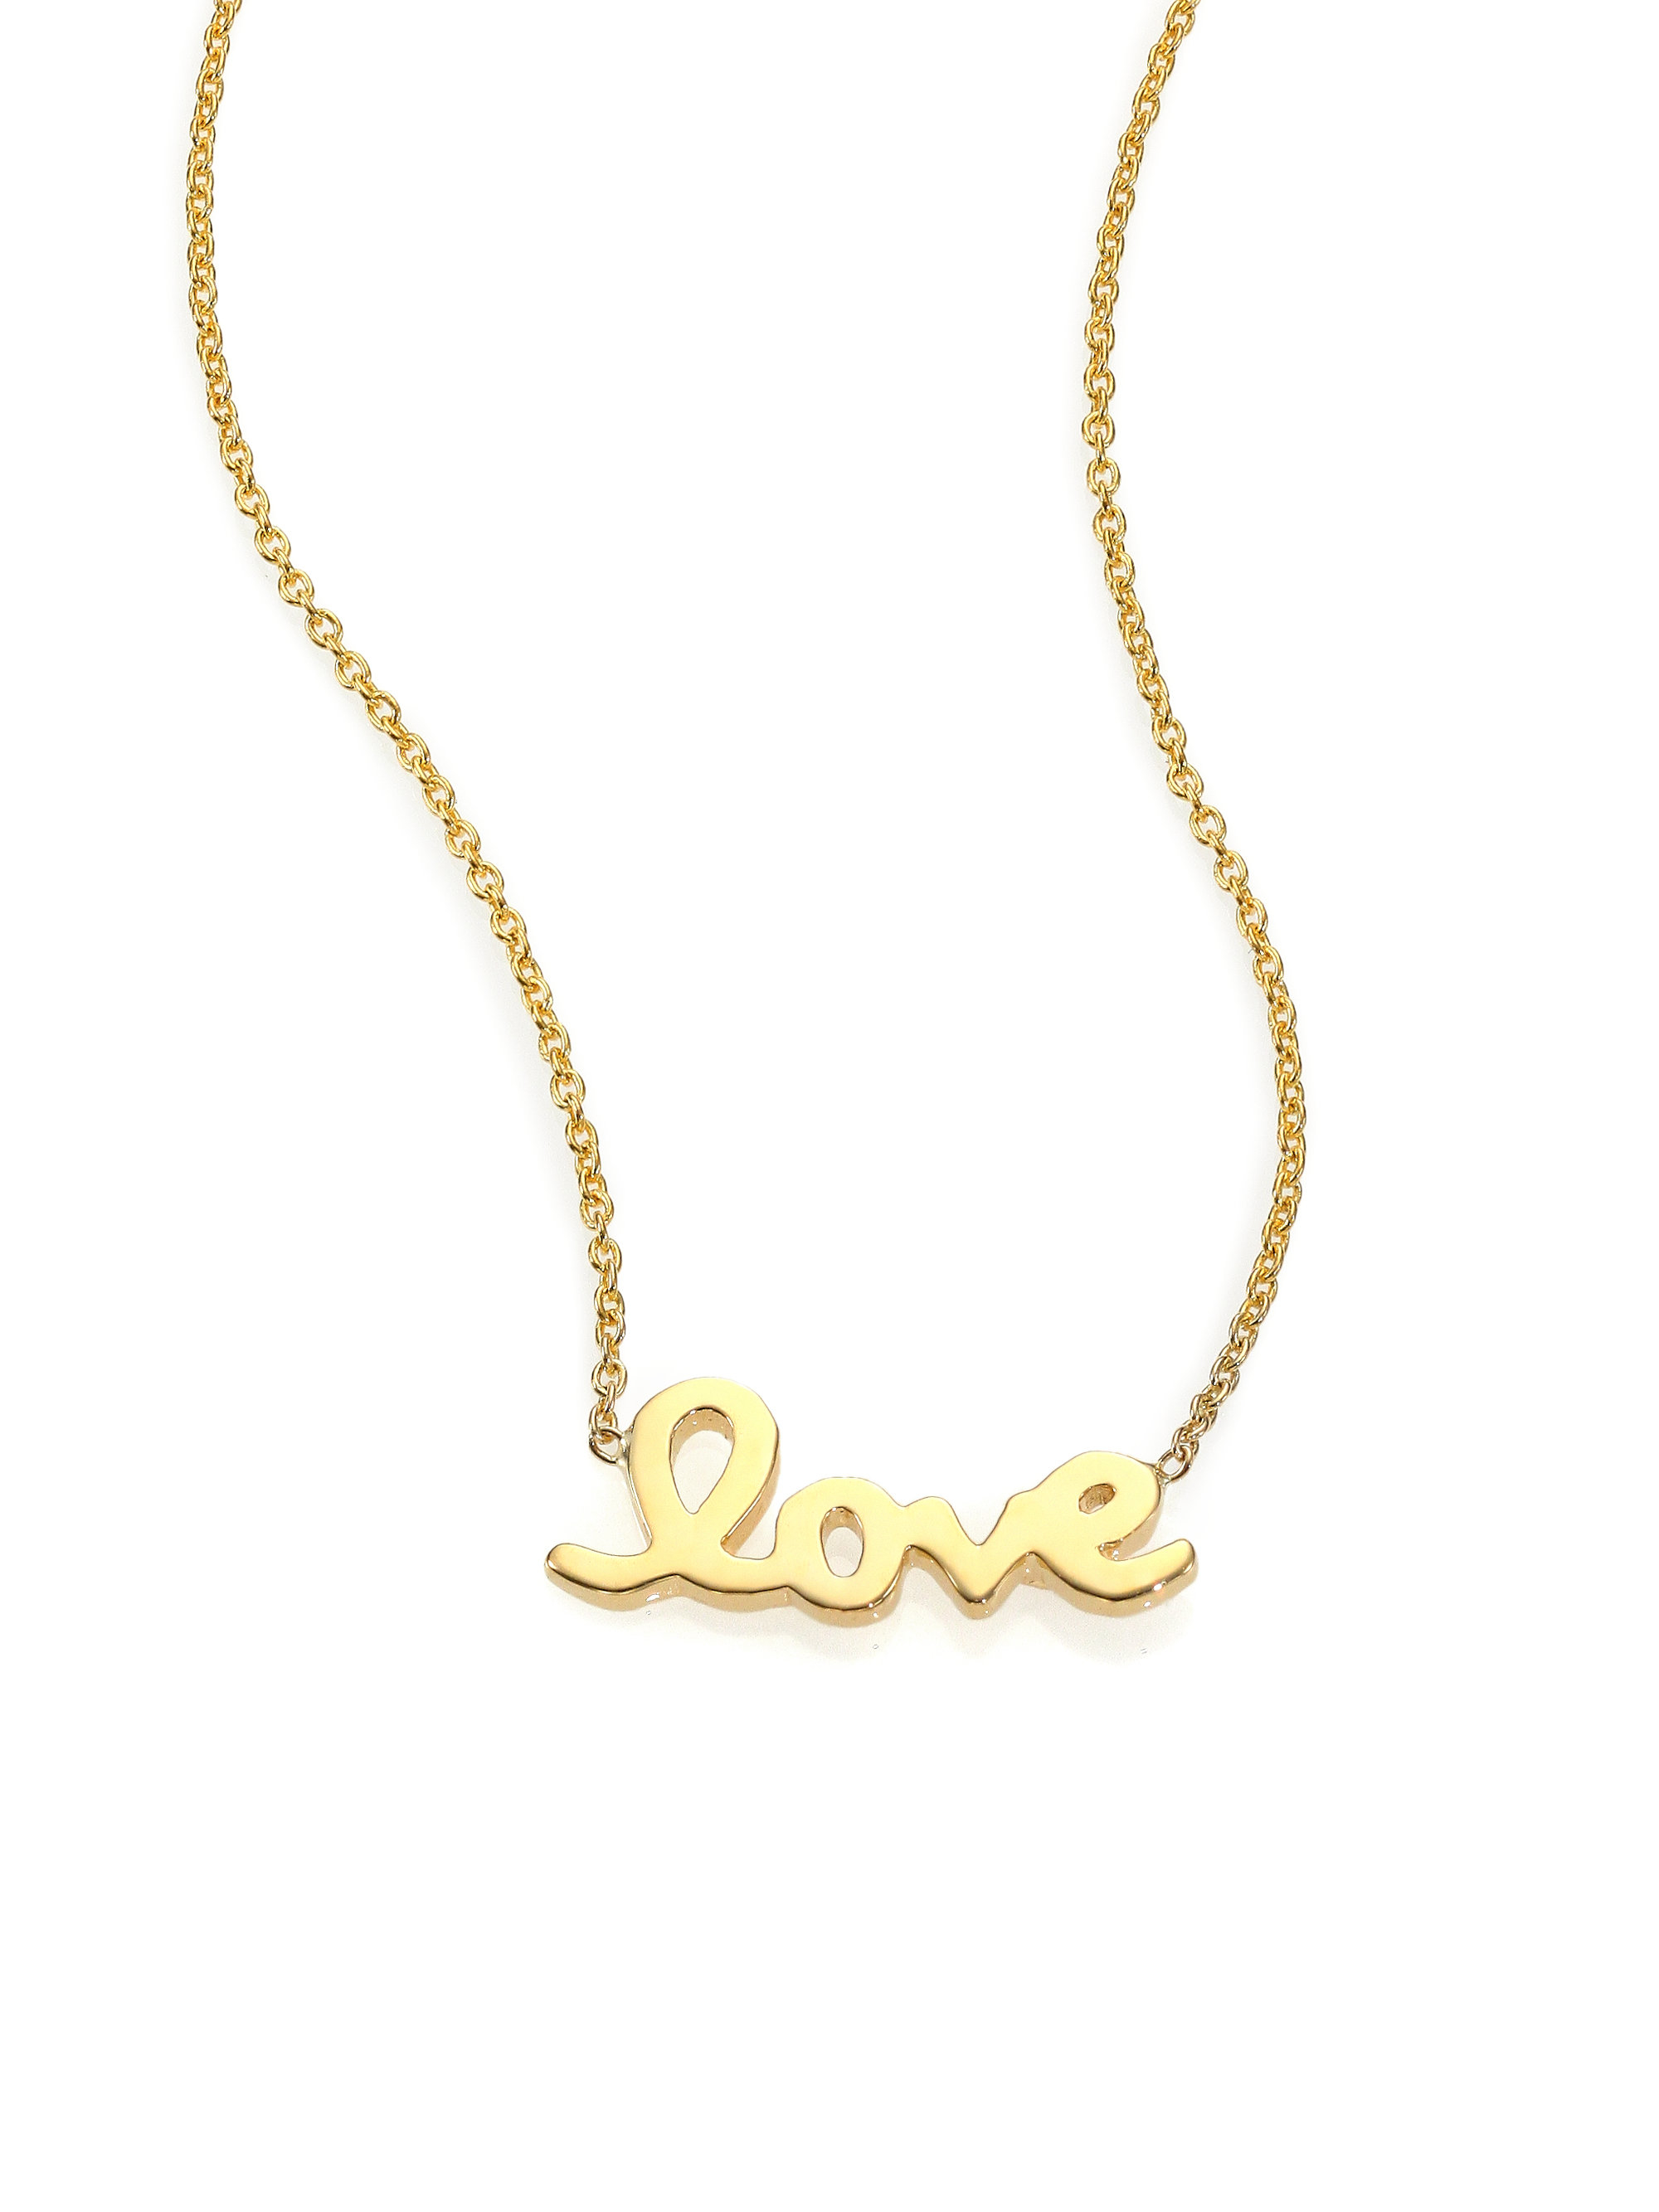 roberto coin tiny treasures 18k yellow gold love letter With roberto coin love letter necklace